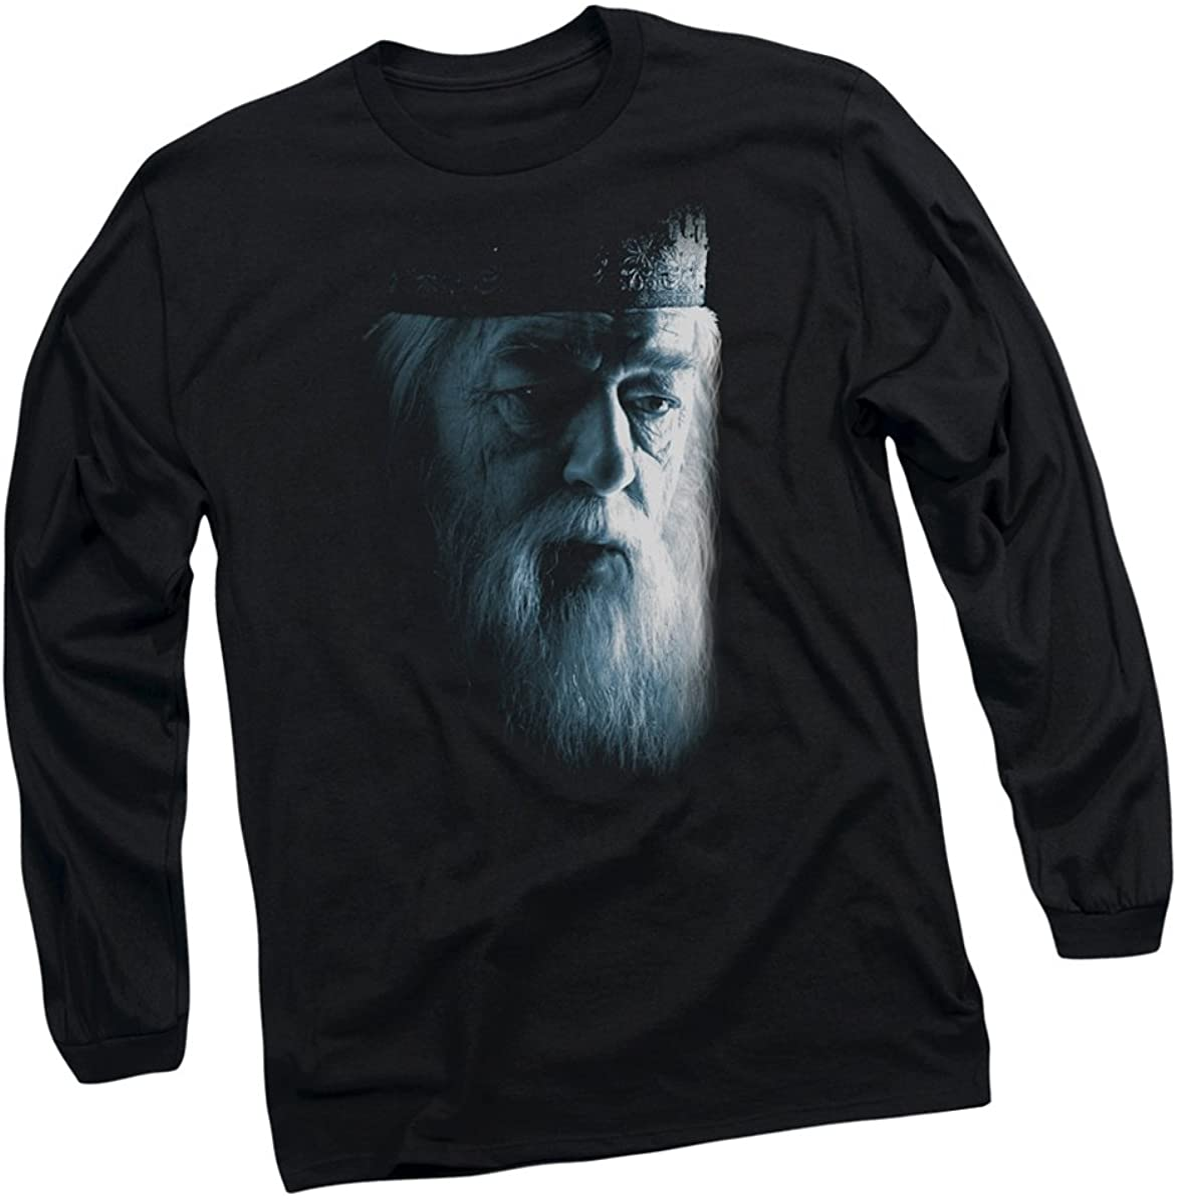 Harry Potter Dumbledore Face Adult Tank Top